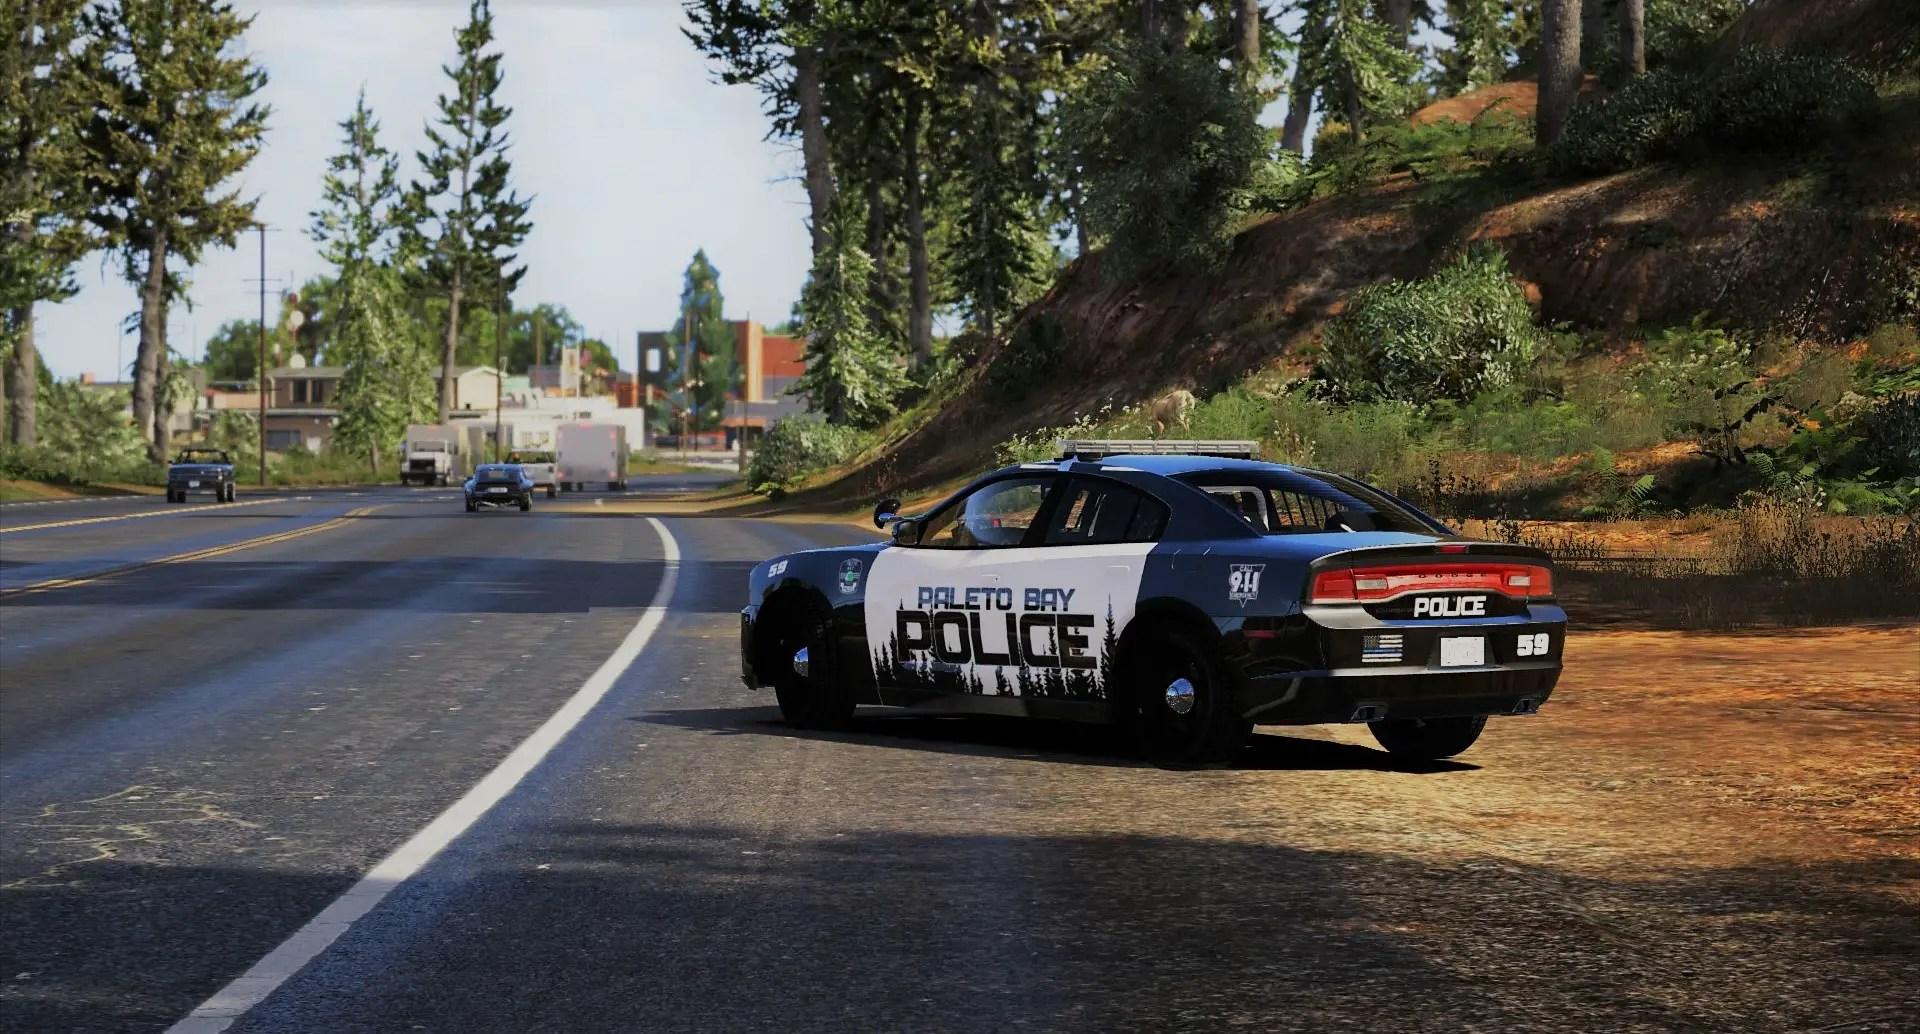 Download Patrolling by Police Department, , Gaming News, Gaming Update, gta Mods, gta V, gta V Mods, SGCArena